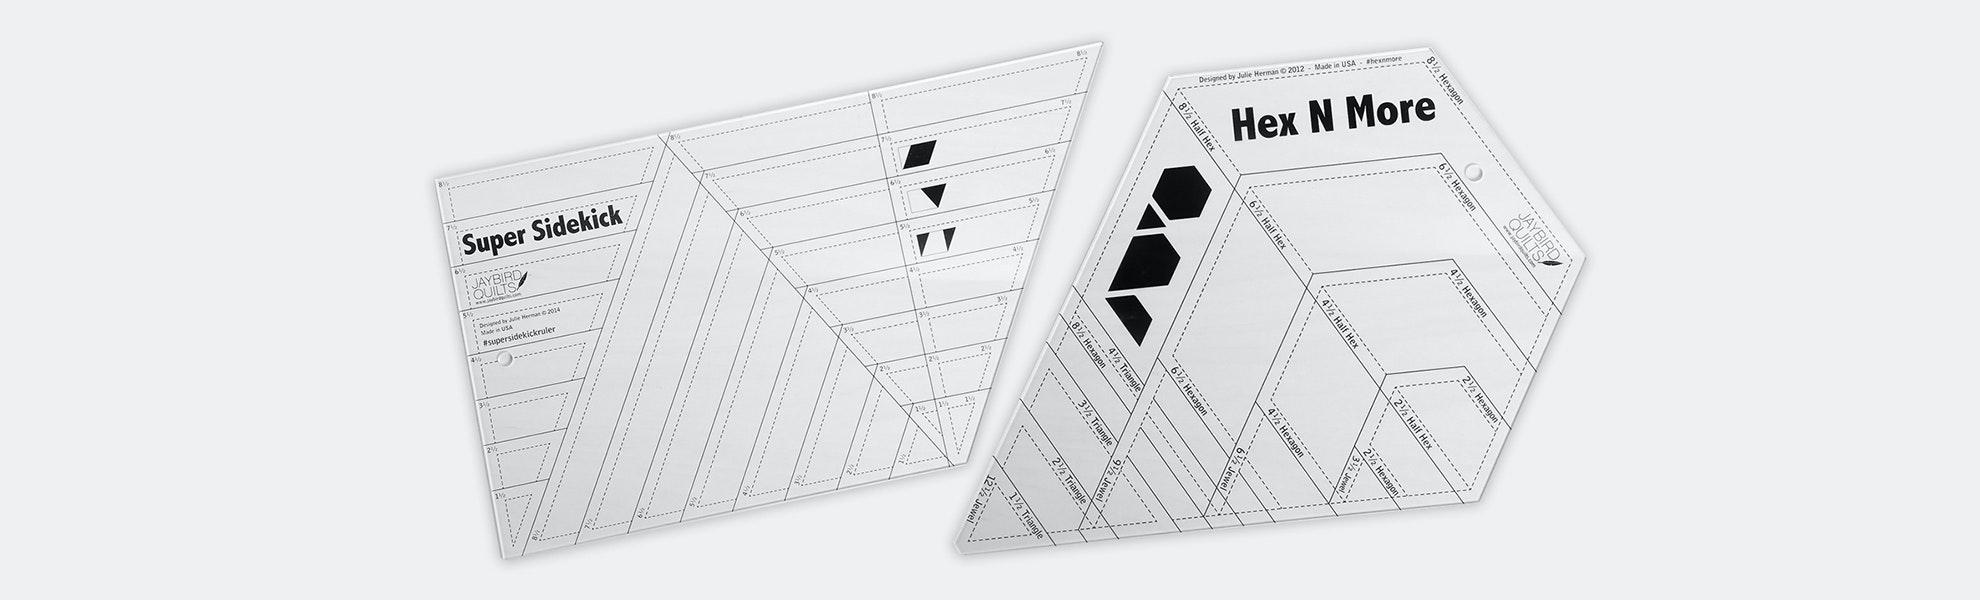 Hex N More Ruler Bundle